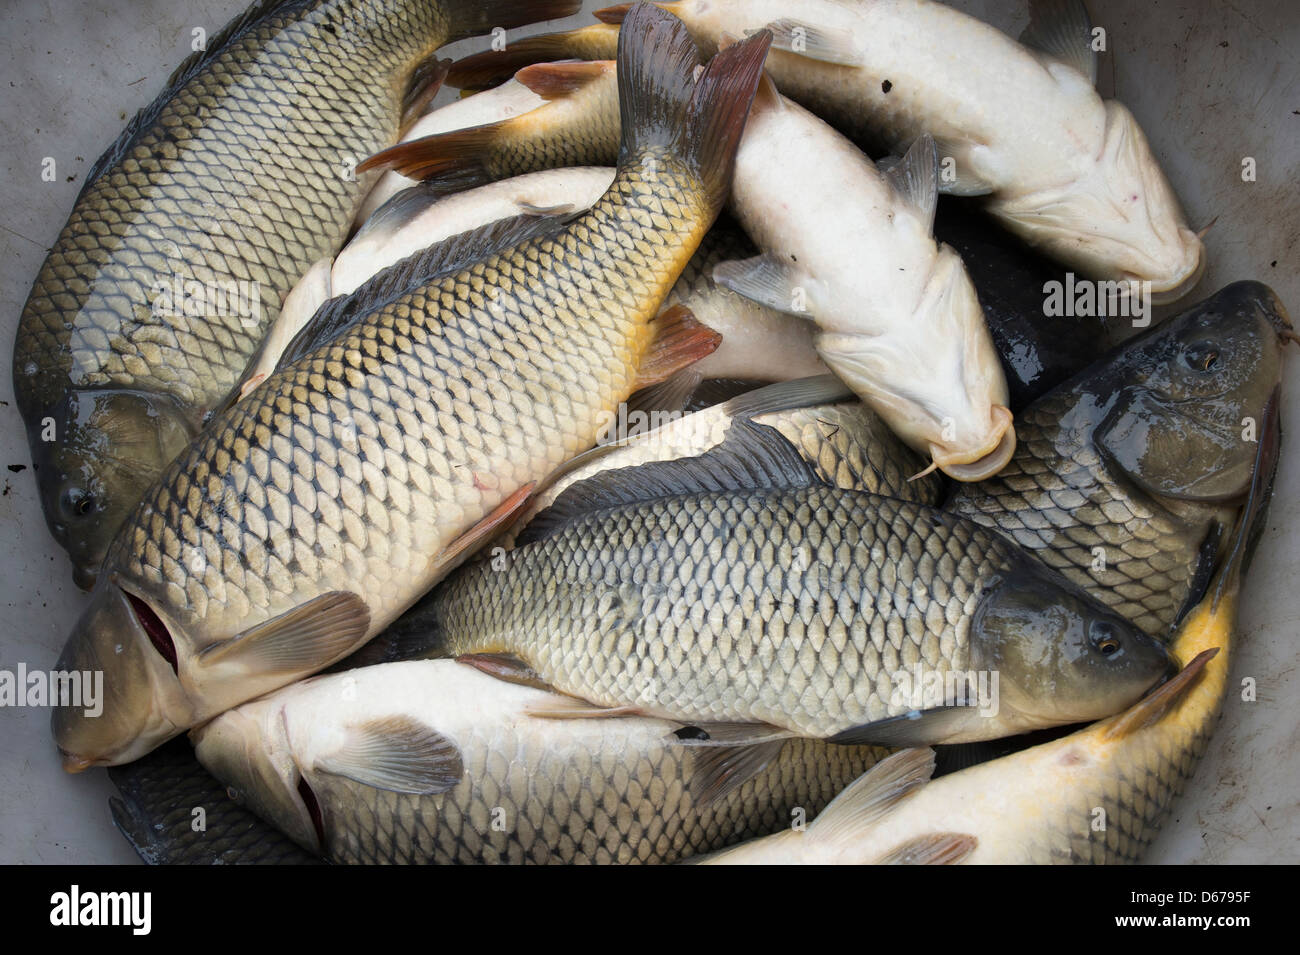 freshwater fishes, ahlhorner fishponds, niedersachsen, germany - Stock Image